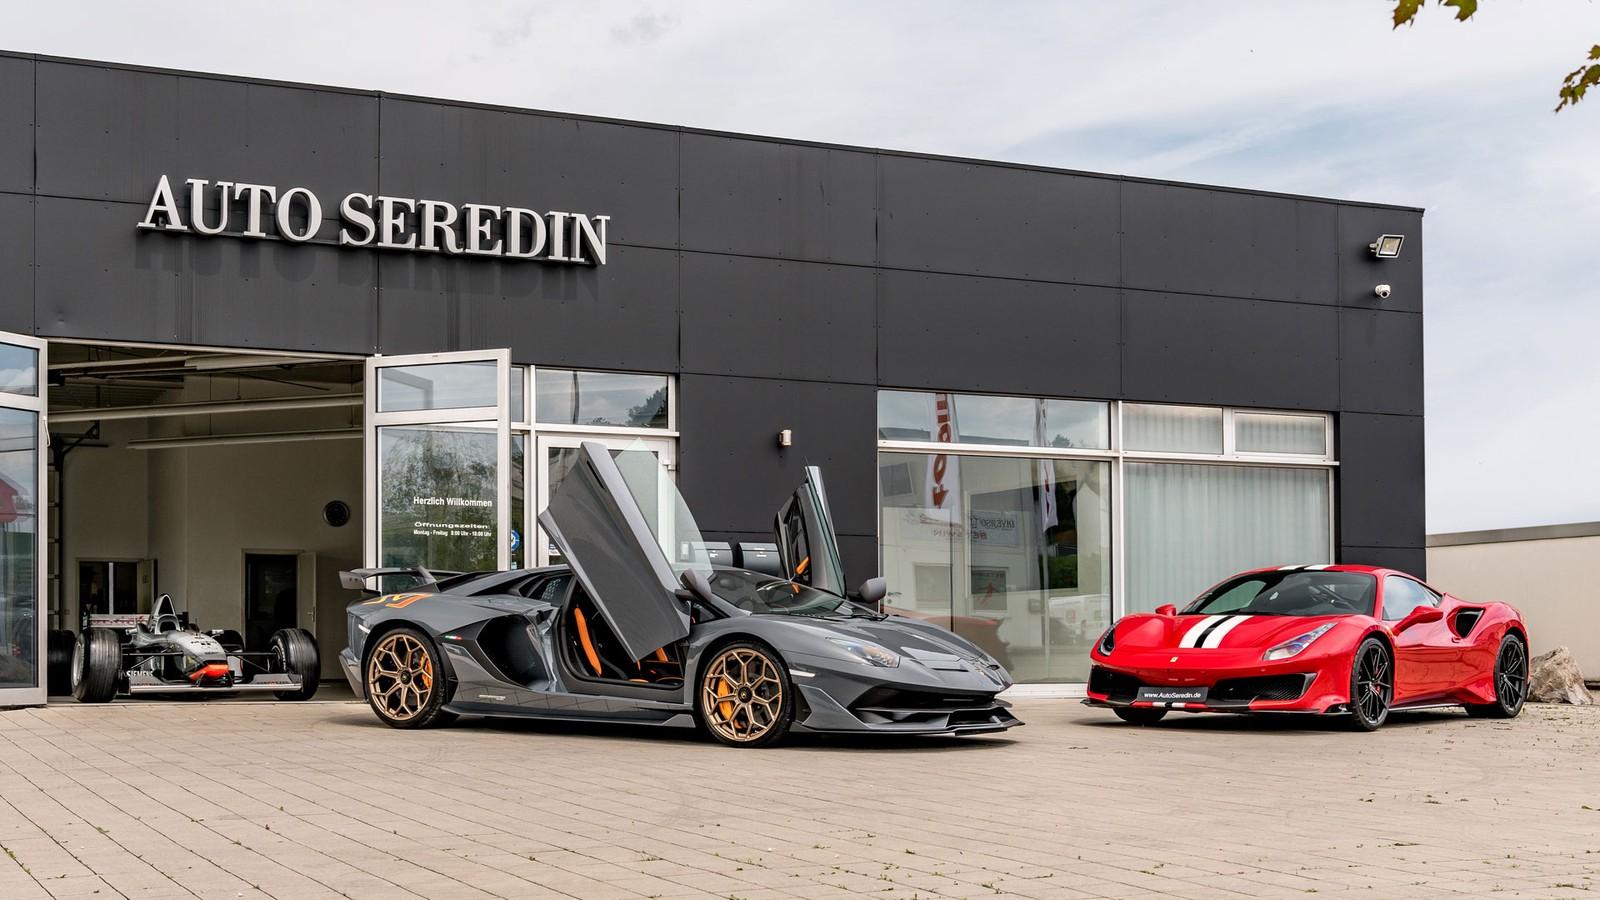 Auto Seredin Sport Luxury Cars For Export In Stuttgart Germany